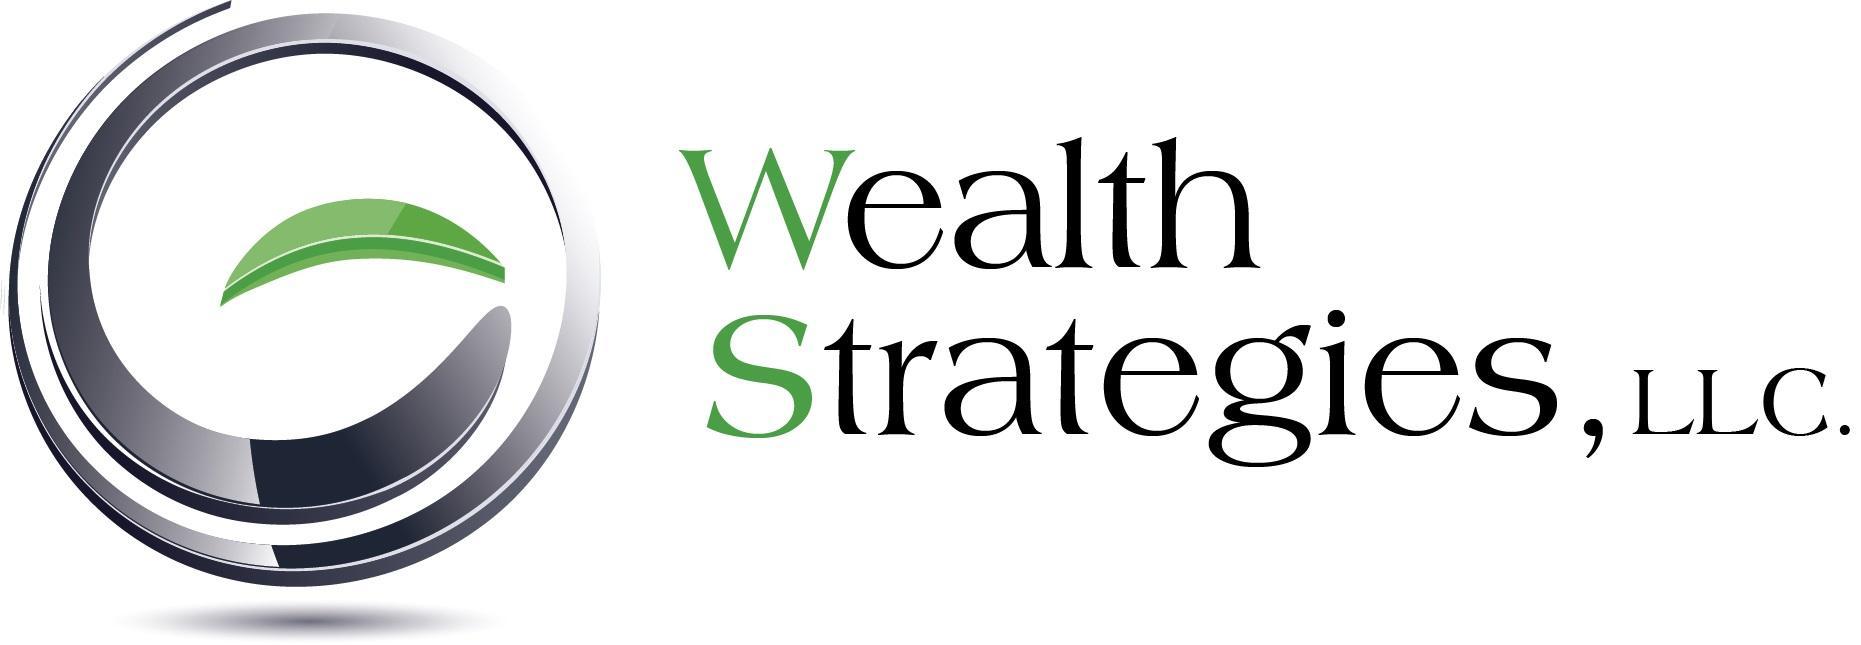 G Wealth Strategies, LLC